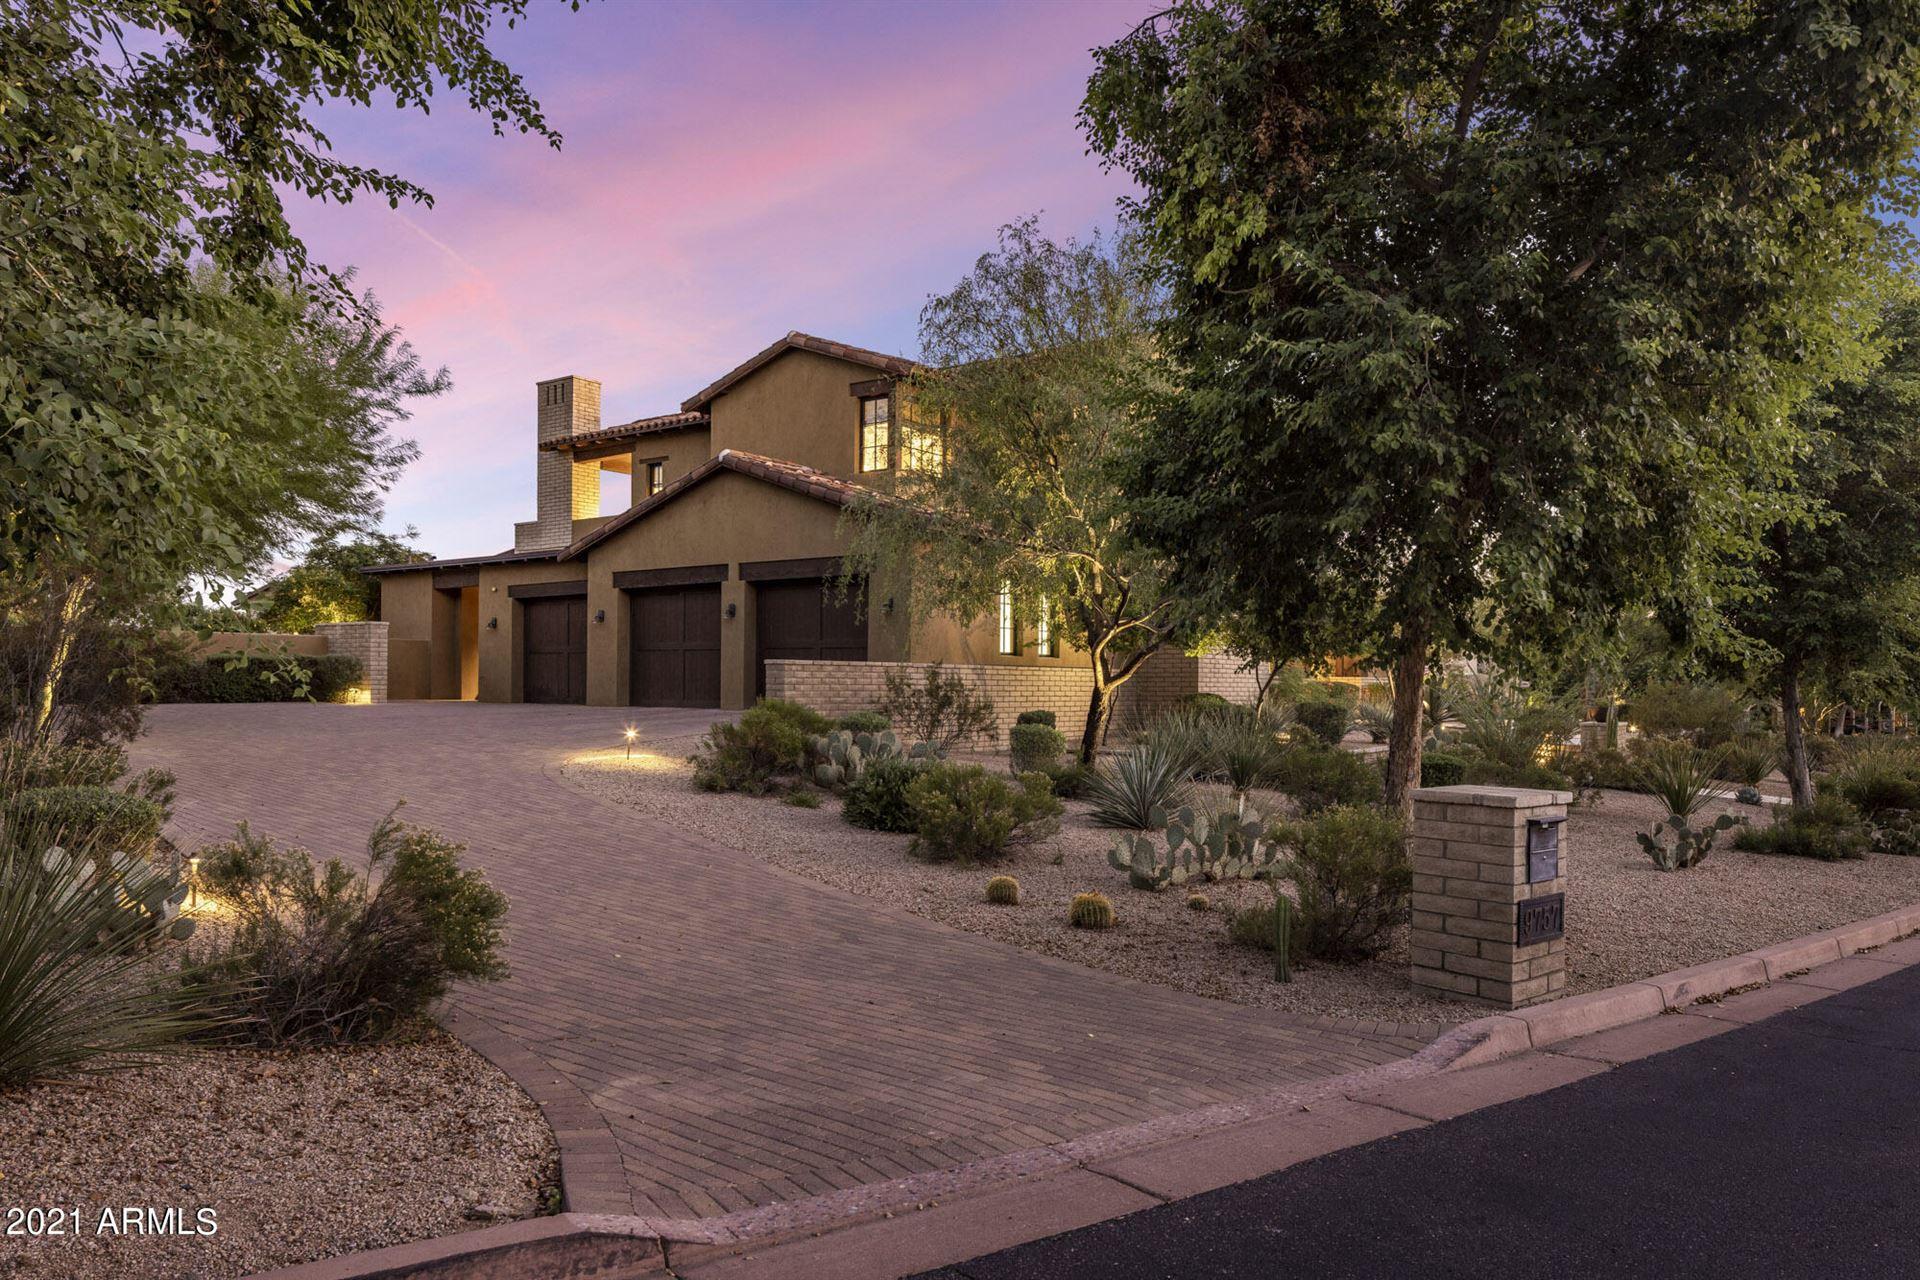 Photo of 9757 E KEMPER Way, Scottsdale, AZ 85255 (MLS # 6292877)